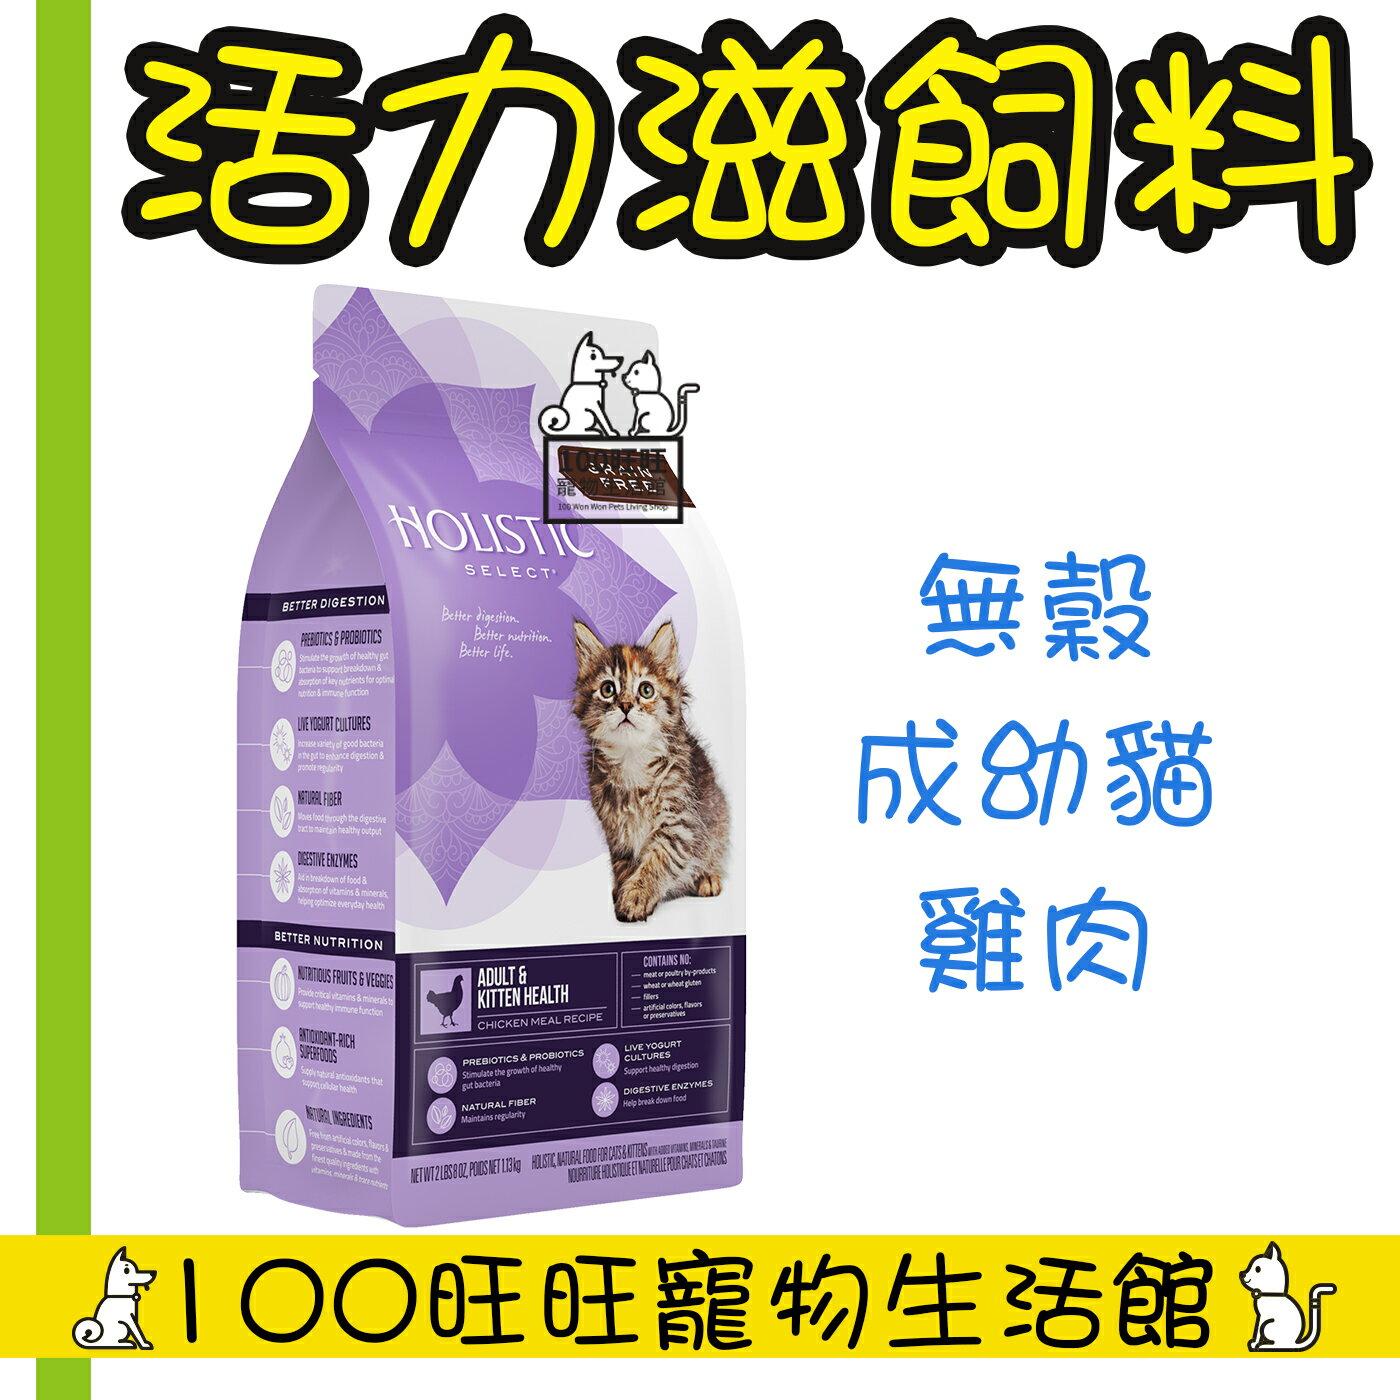 Holistic Select 活力滋 無穀成幼貓 雞肉聰明成長配方 2.5磅 1.13 kg